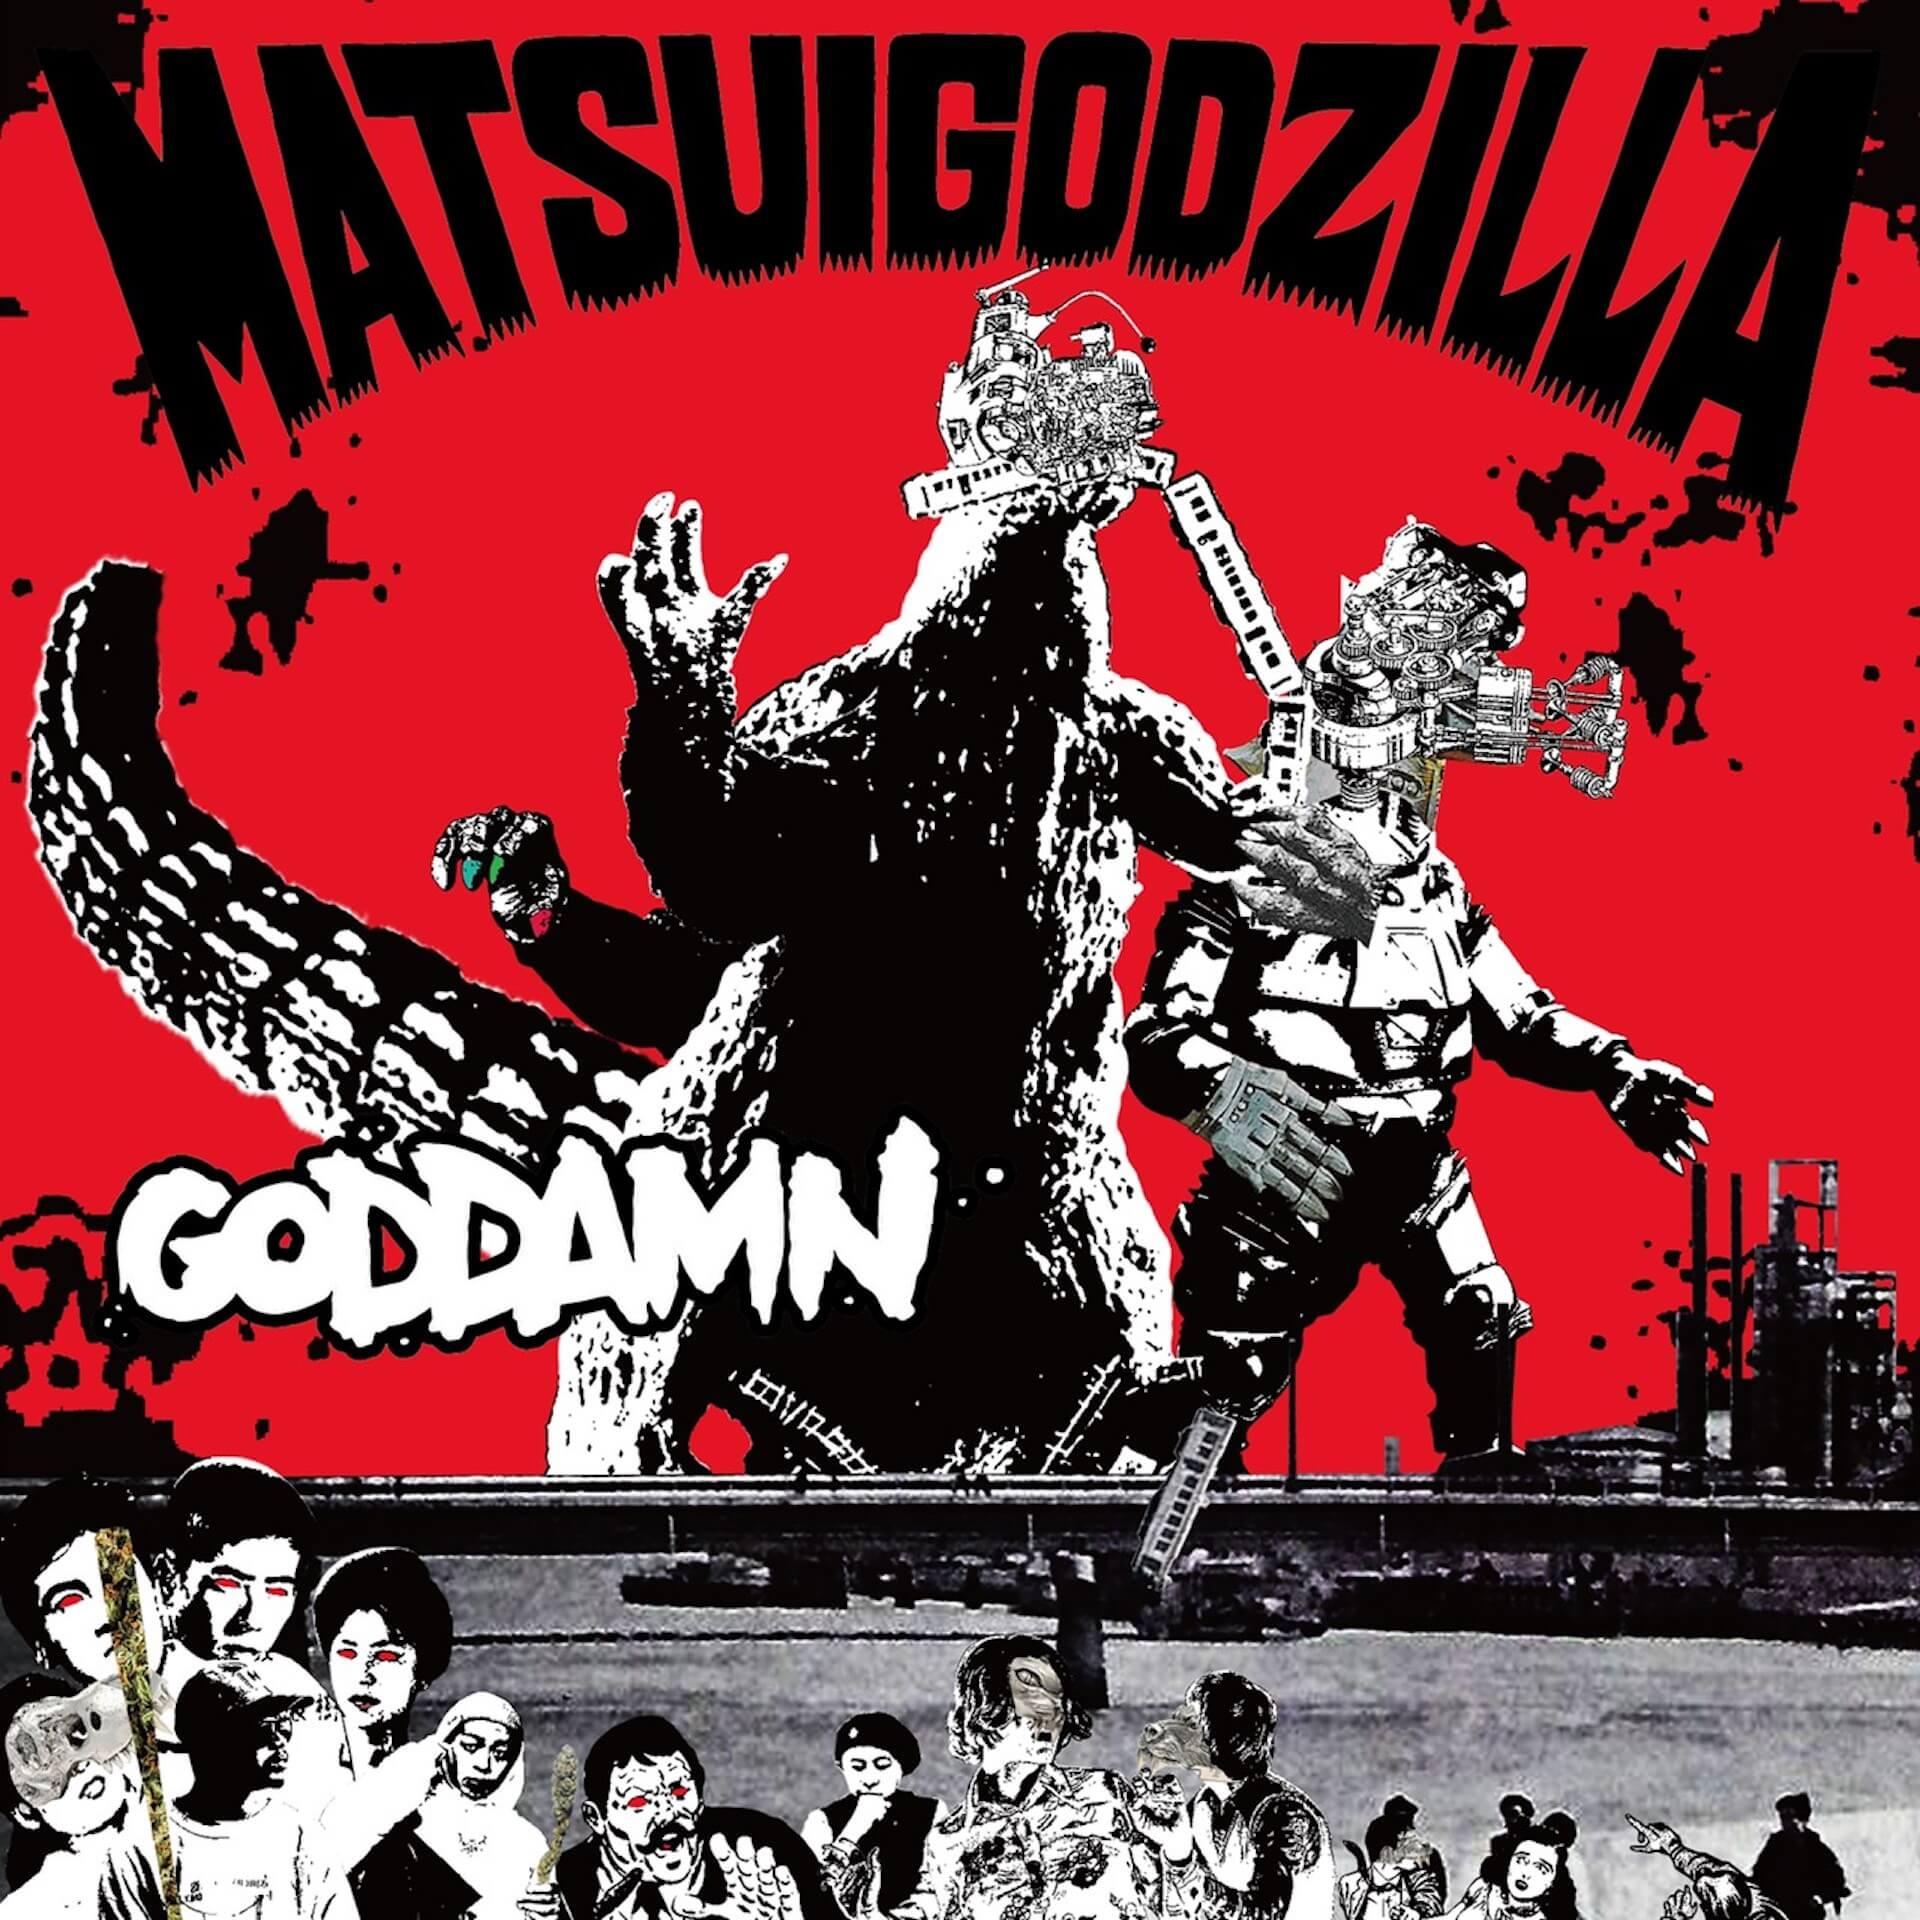 BAKU率いる〈KAIKOO〉より、MATSUIGODZILLAのデビューシングル「GODDAMN」がリリース|rkemishi、MILES WORDが客演 ジャケにはKILLER-BONG参加 music210120-matsuigodzilla-1